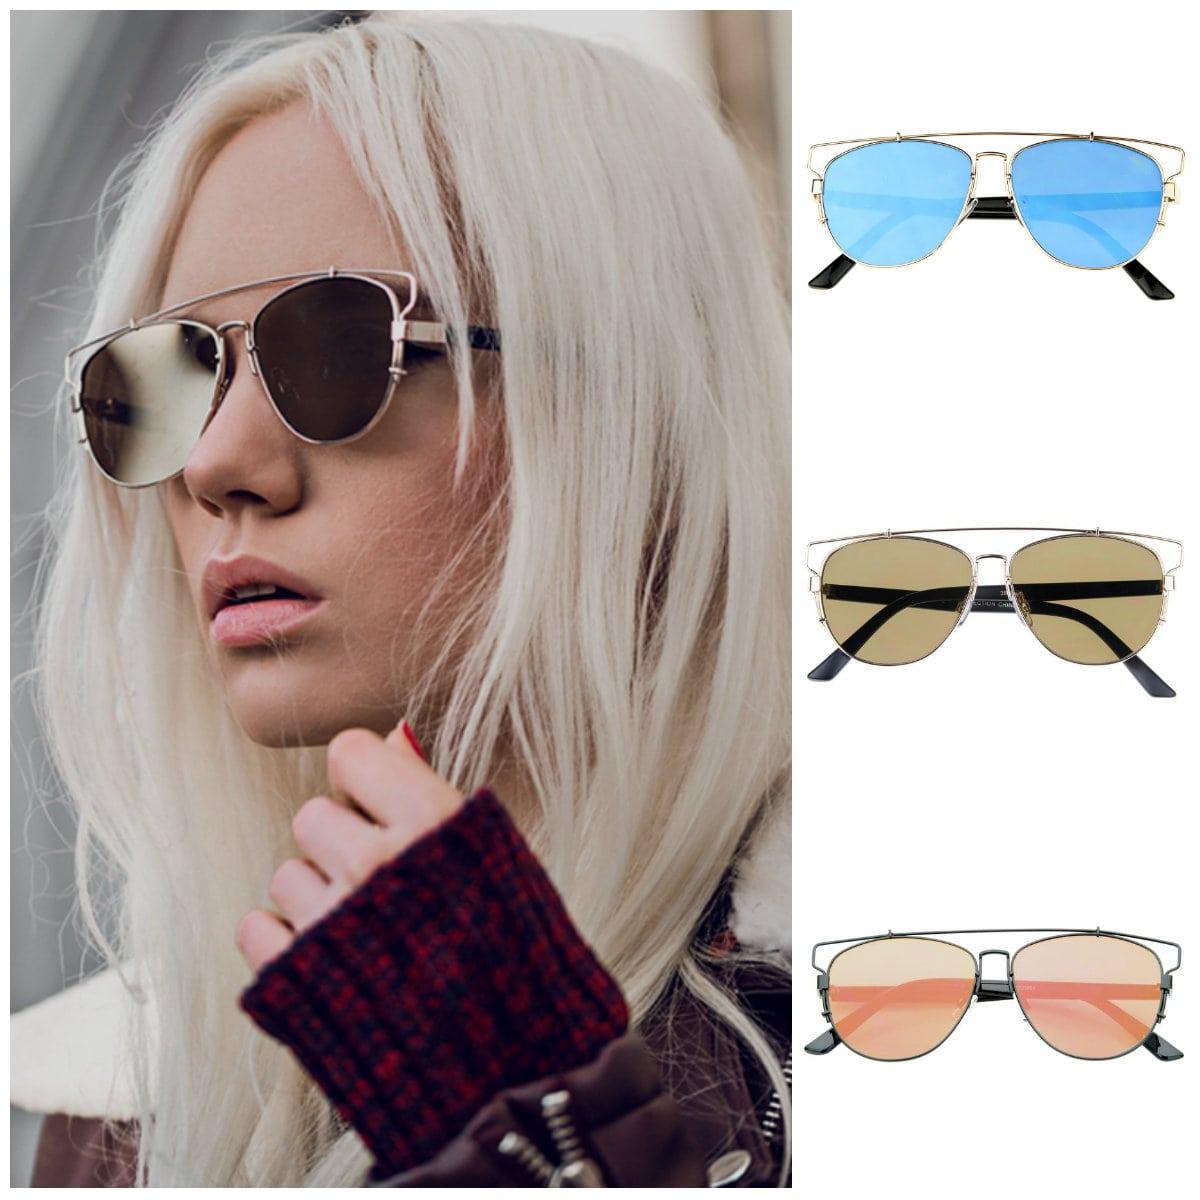 modern-flat-front-sunglasses